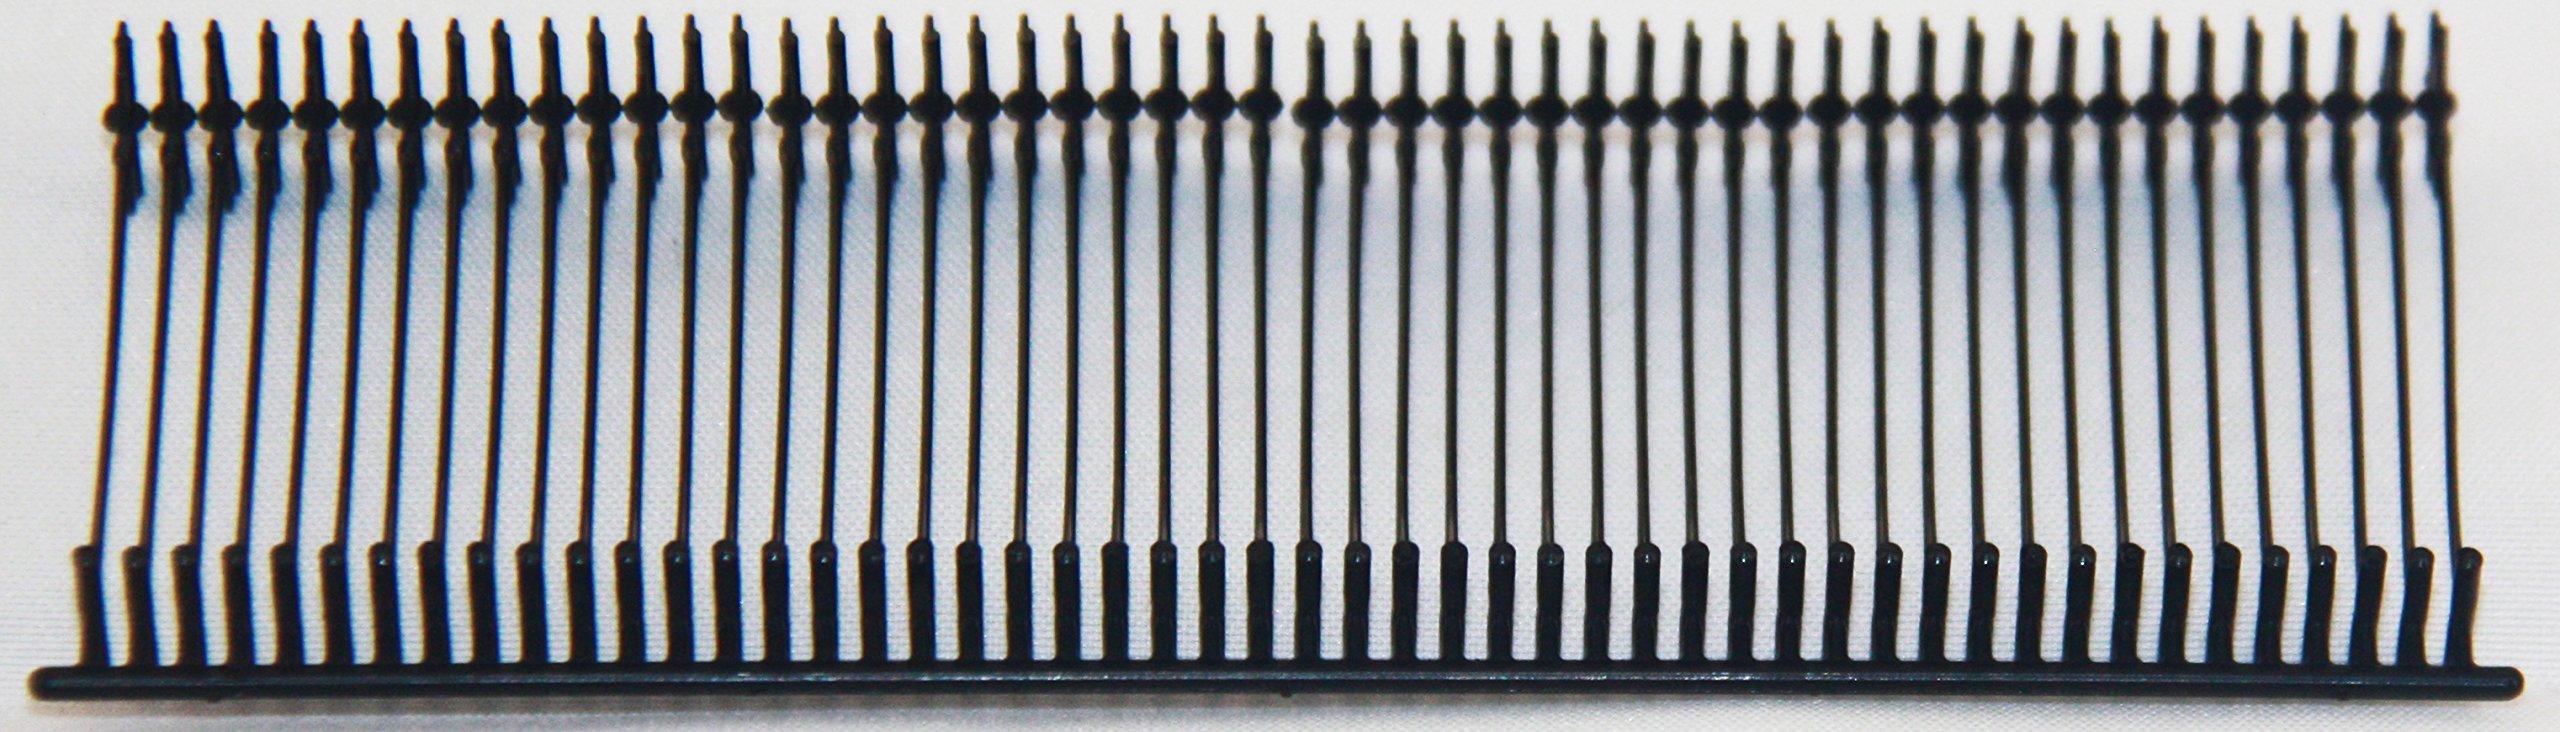 Amram Standard Tagging Attachments 3'', 50/Clip, 5,000/box, Black by AMRAM (Image #1)